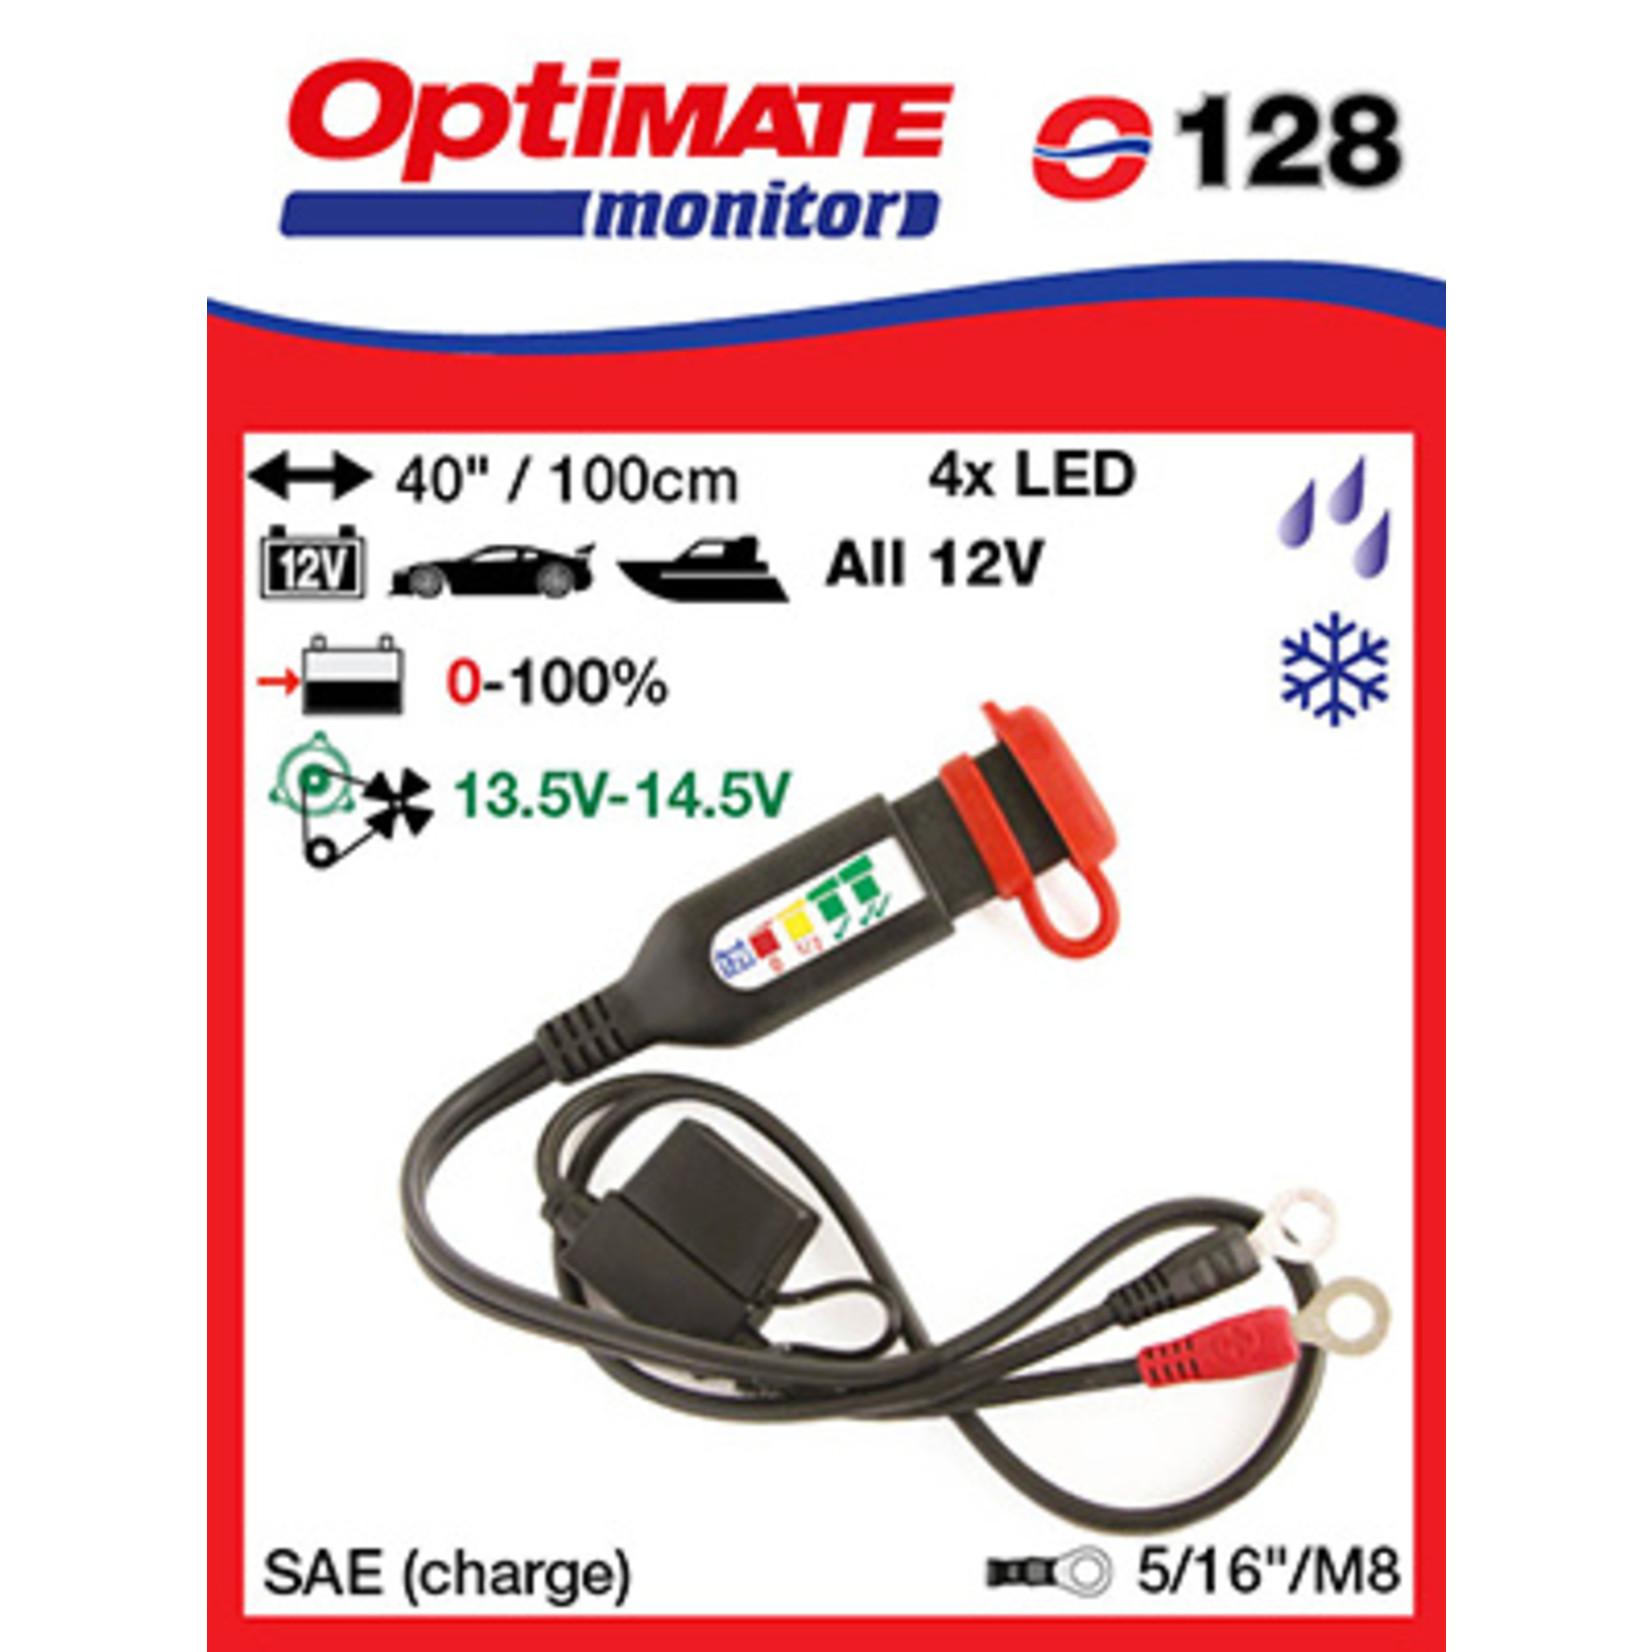 OptiMate OptiMate O-128 Battery monitor 12V